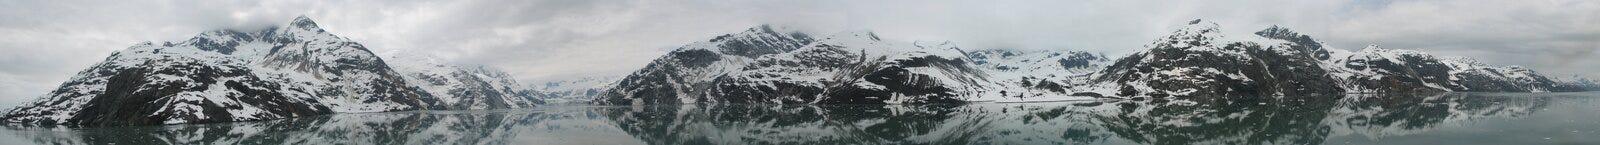 Gletscher-Schacht Stockfotos